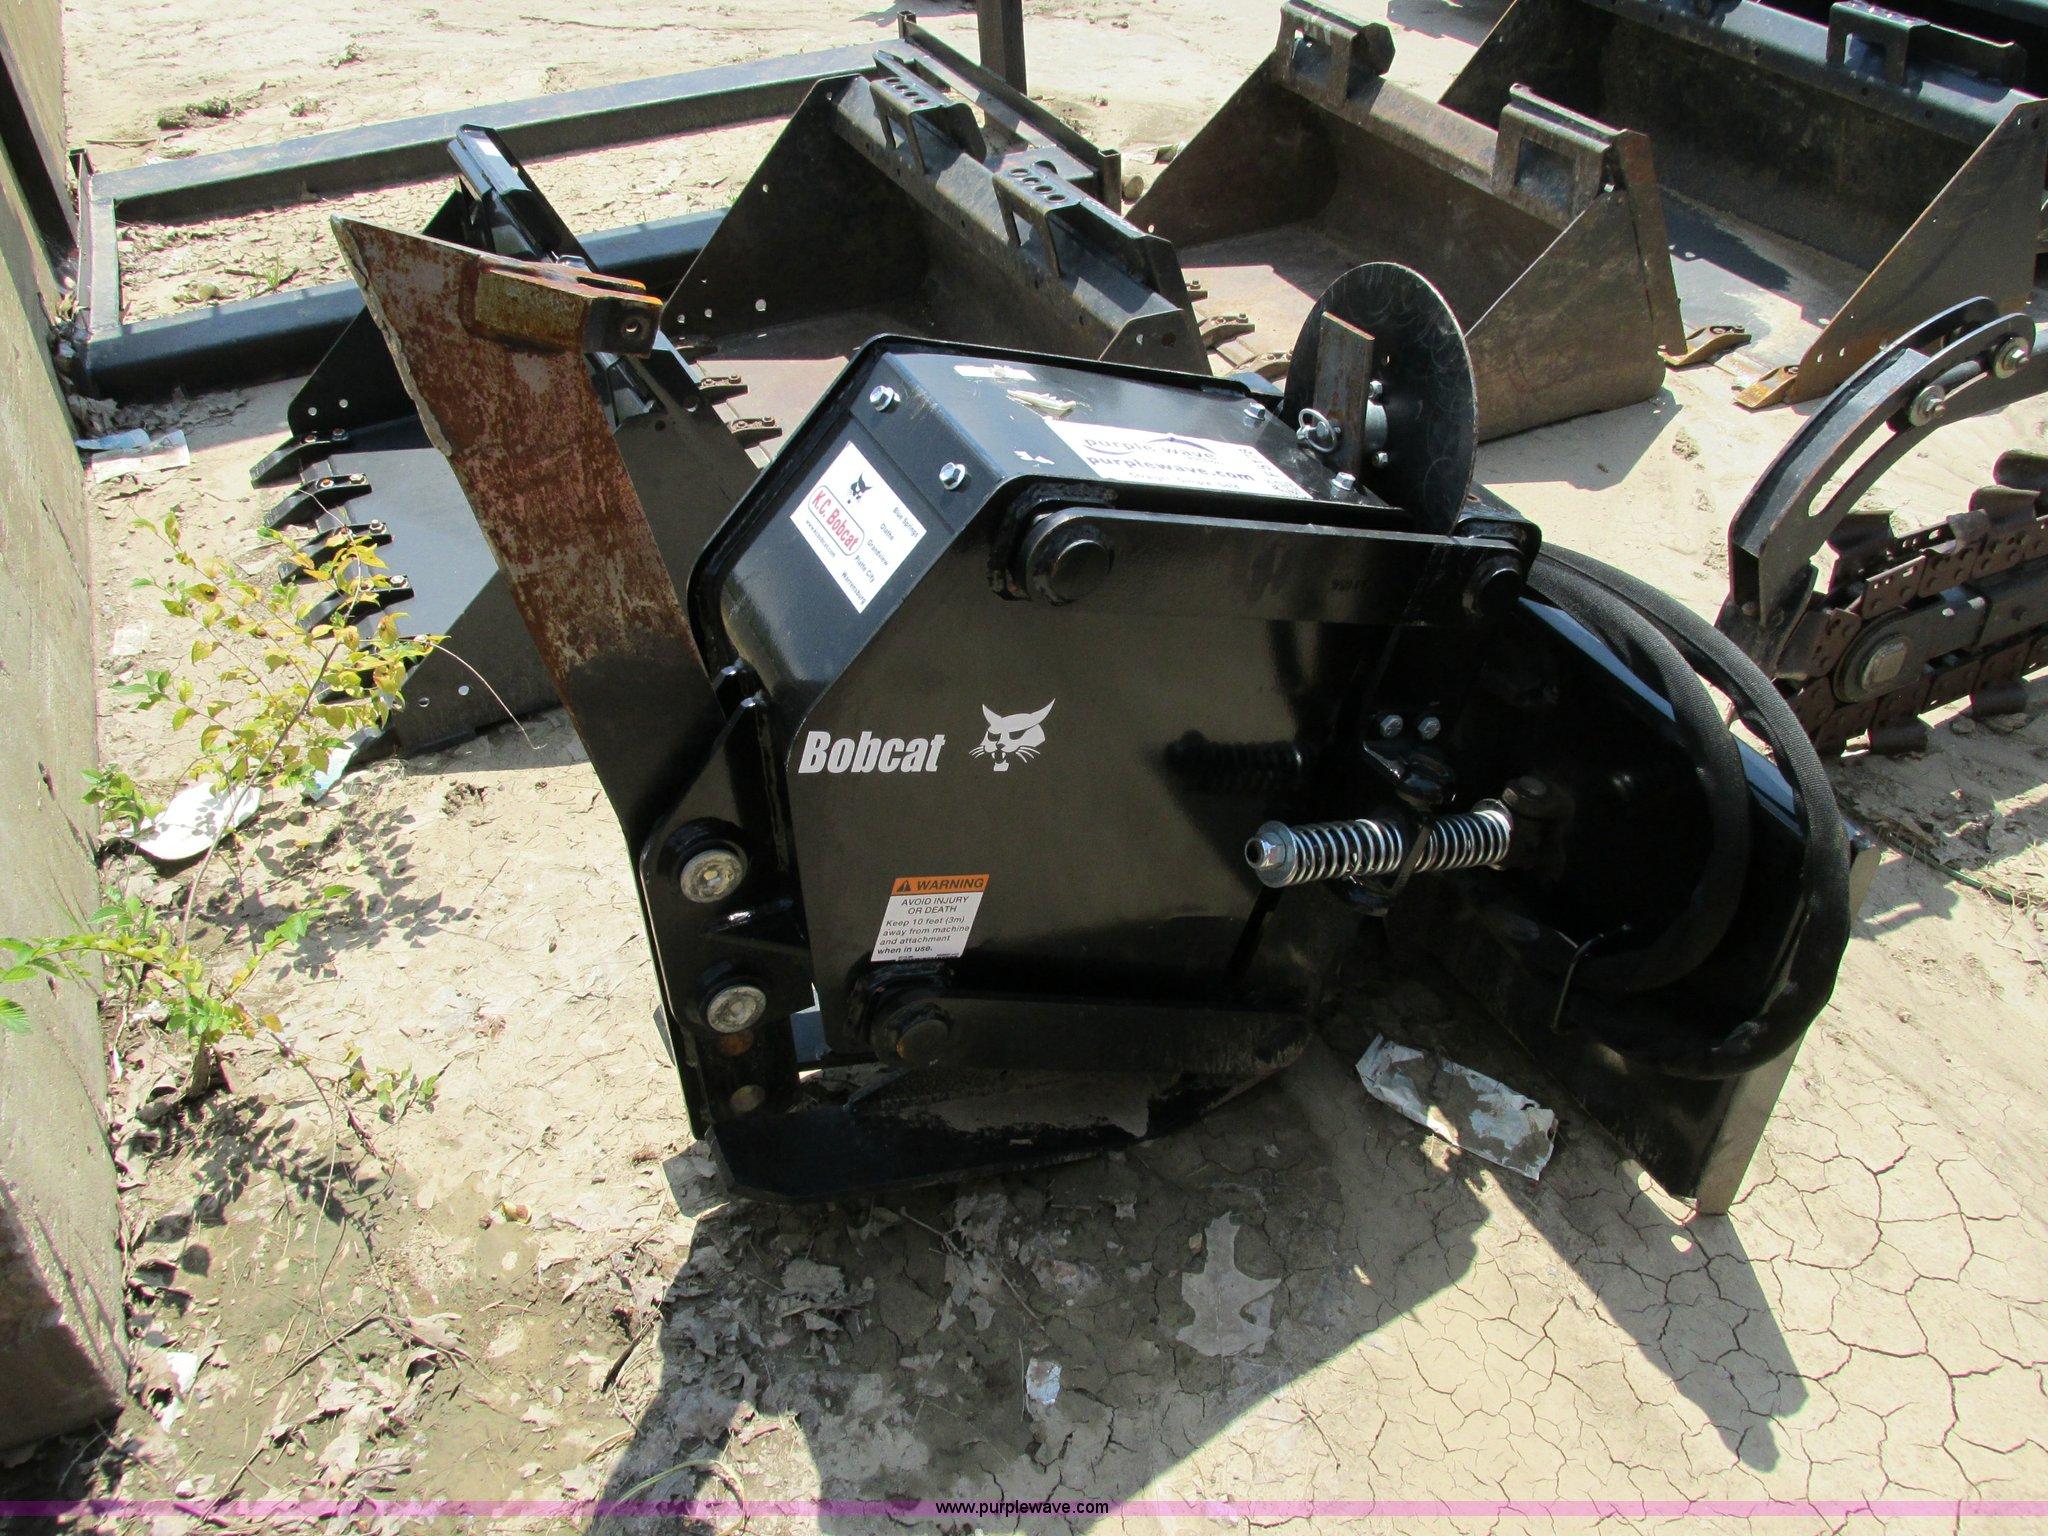 Bobcat vibratory plow | Item F5178 | SOLD! August 29 Constru